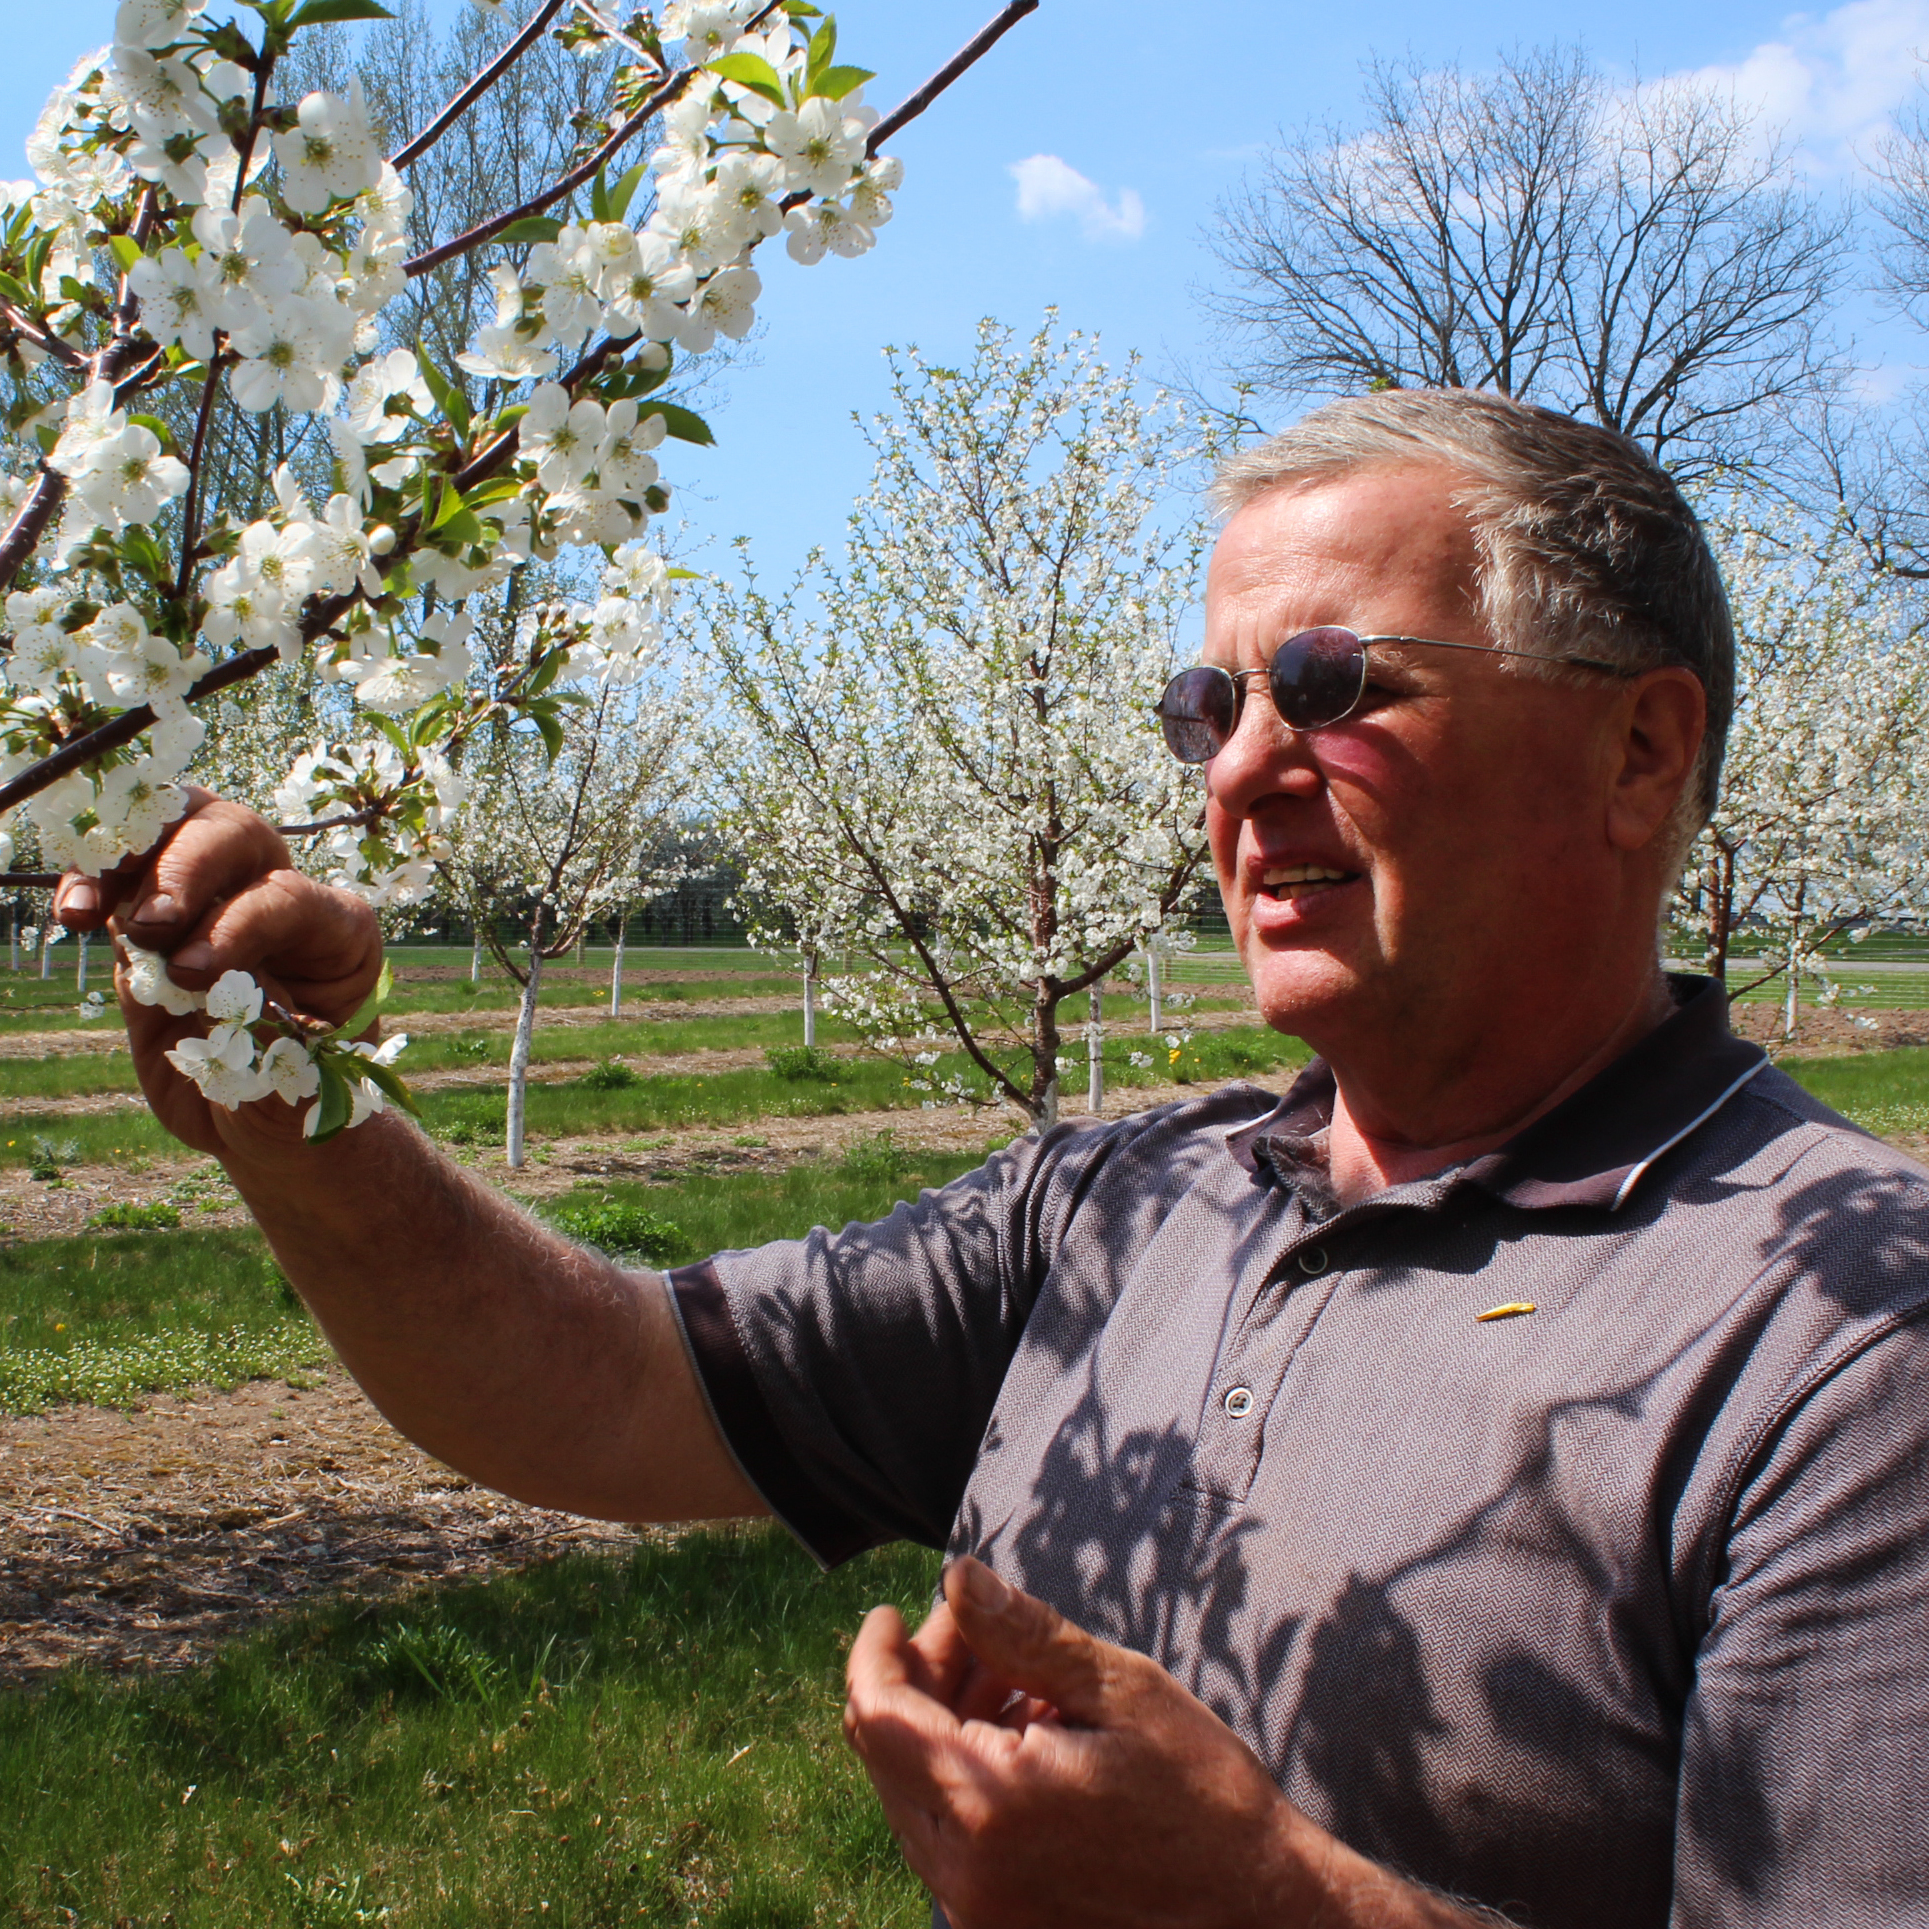 Mike Van Agtmael grows tart cherries on his farm near Hart, Mich.